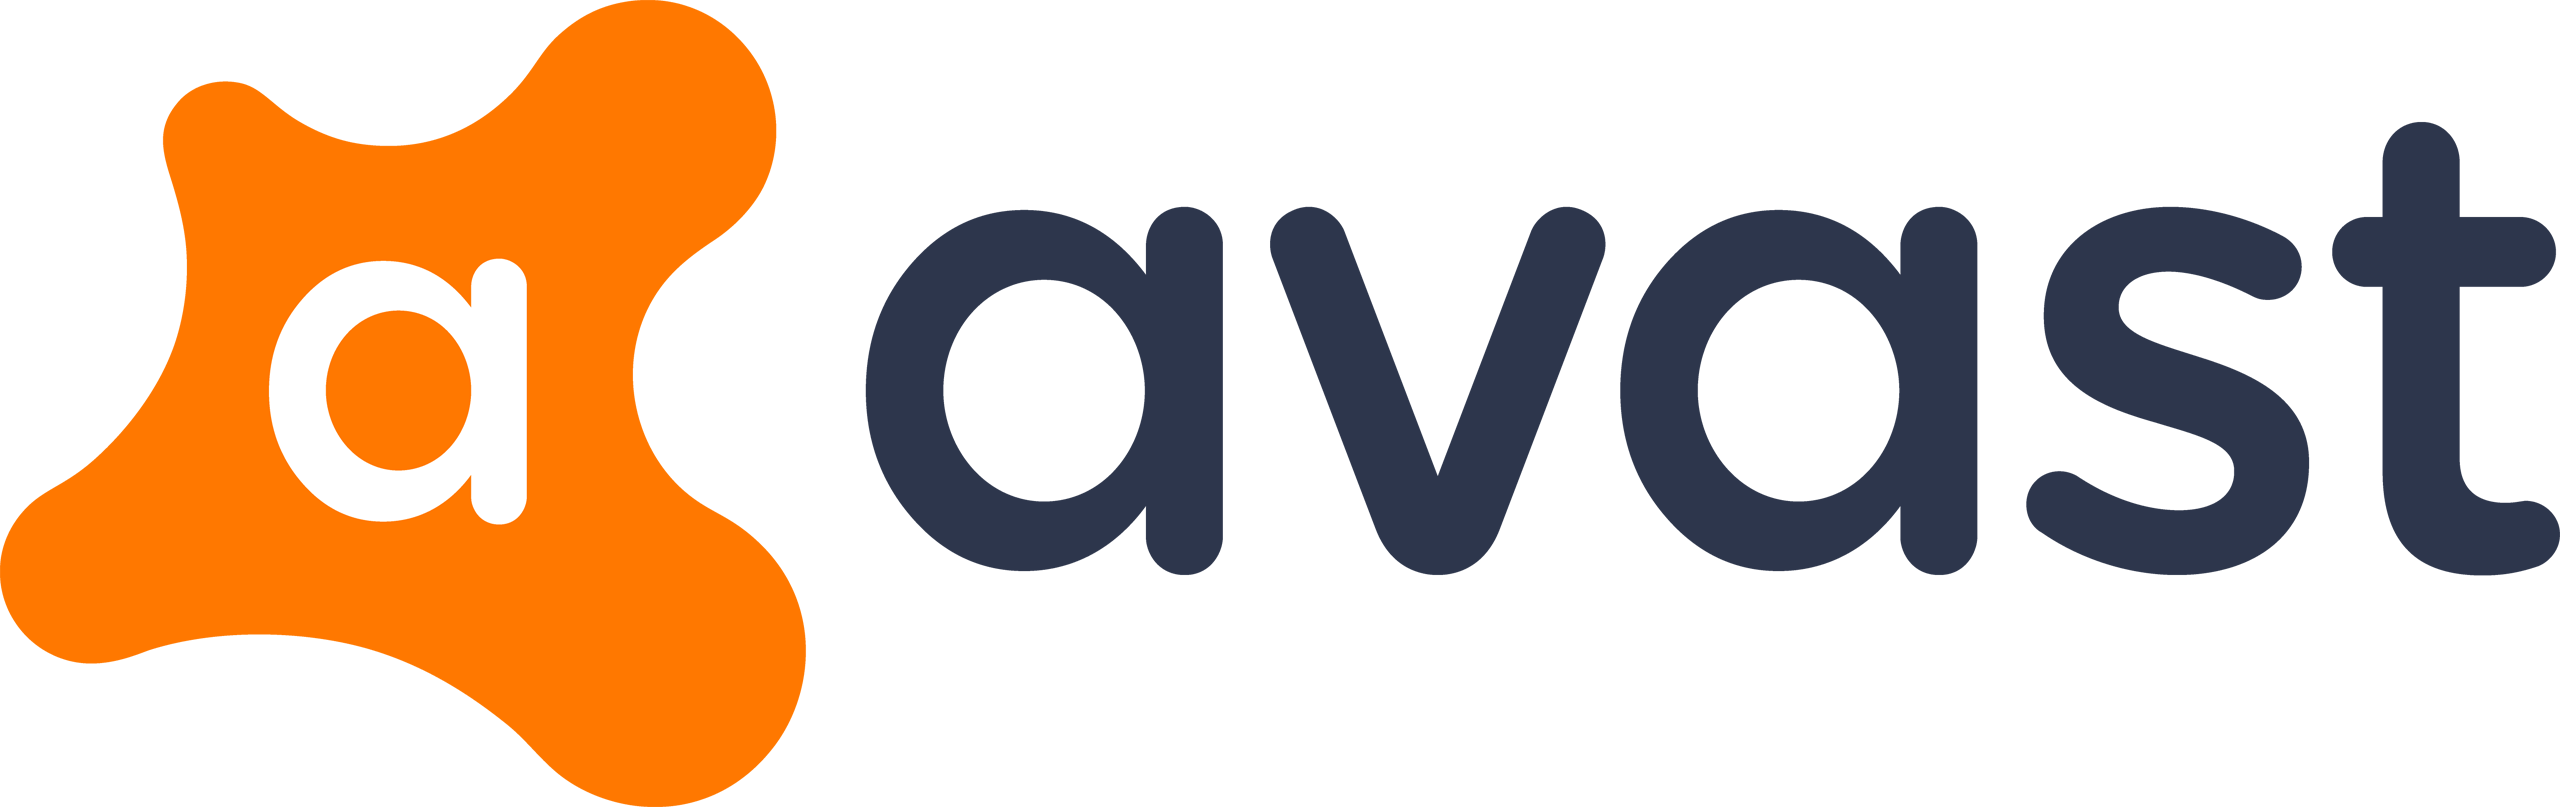 Avast Logo PNG